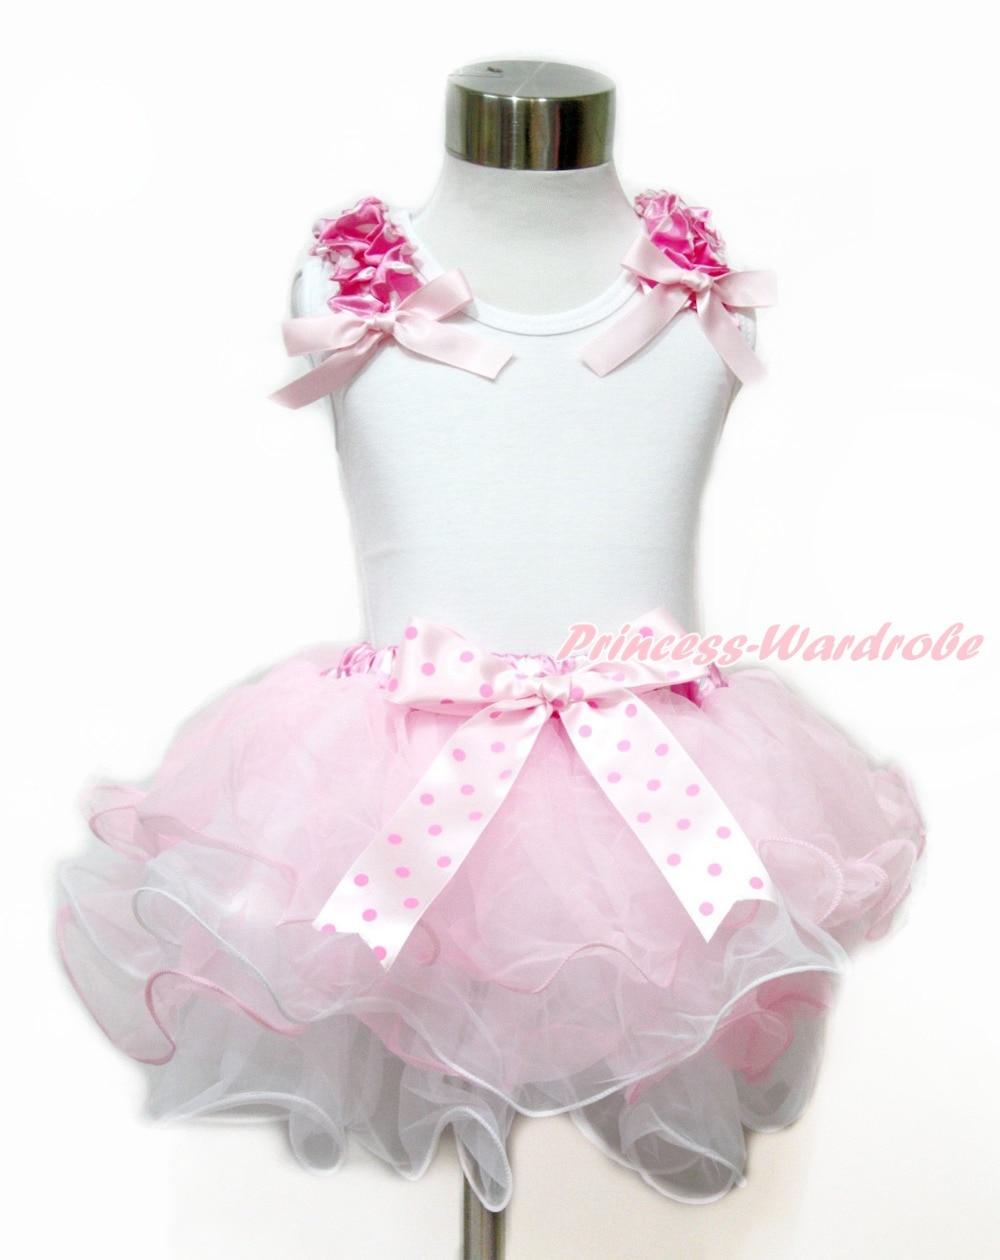 Easter Plain Style Tank Top Hot Pink Bow Light Pink Bow White Light Pink Petal Pettiskirt MAMG1103<br><br>Aliexpress